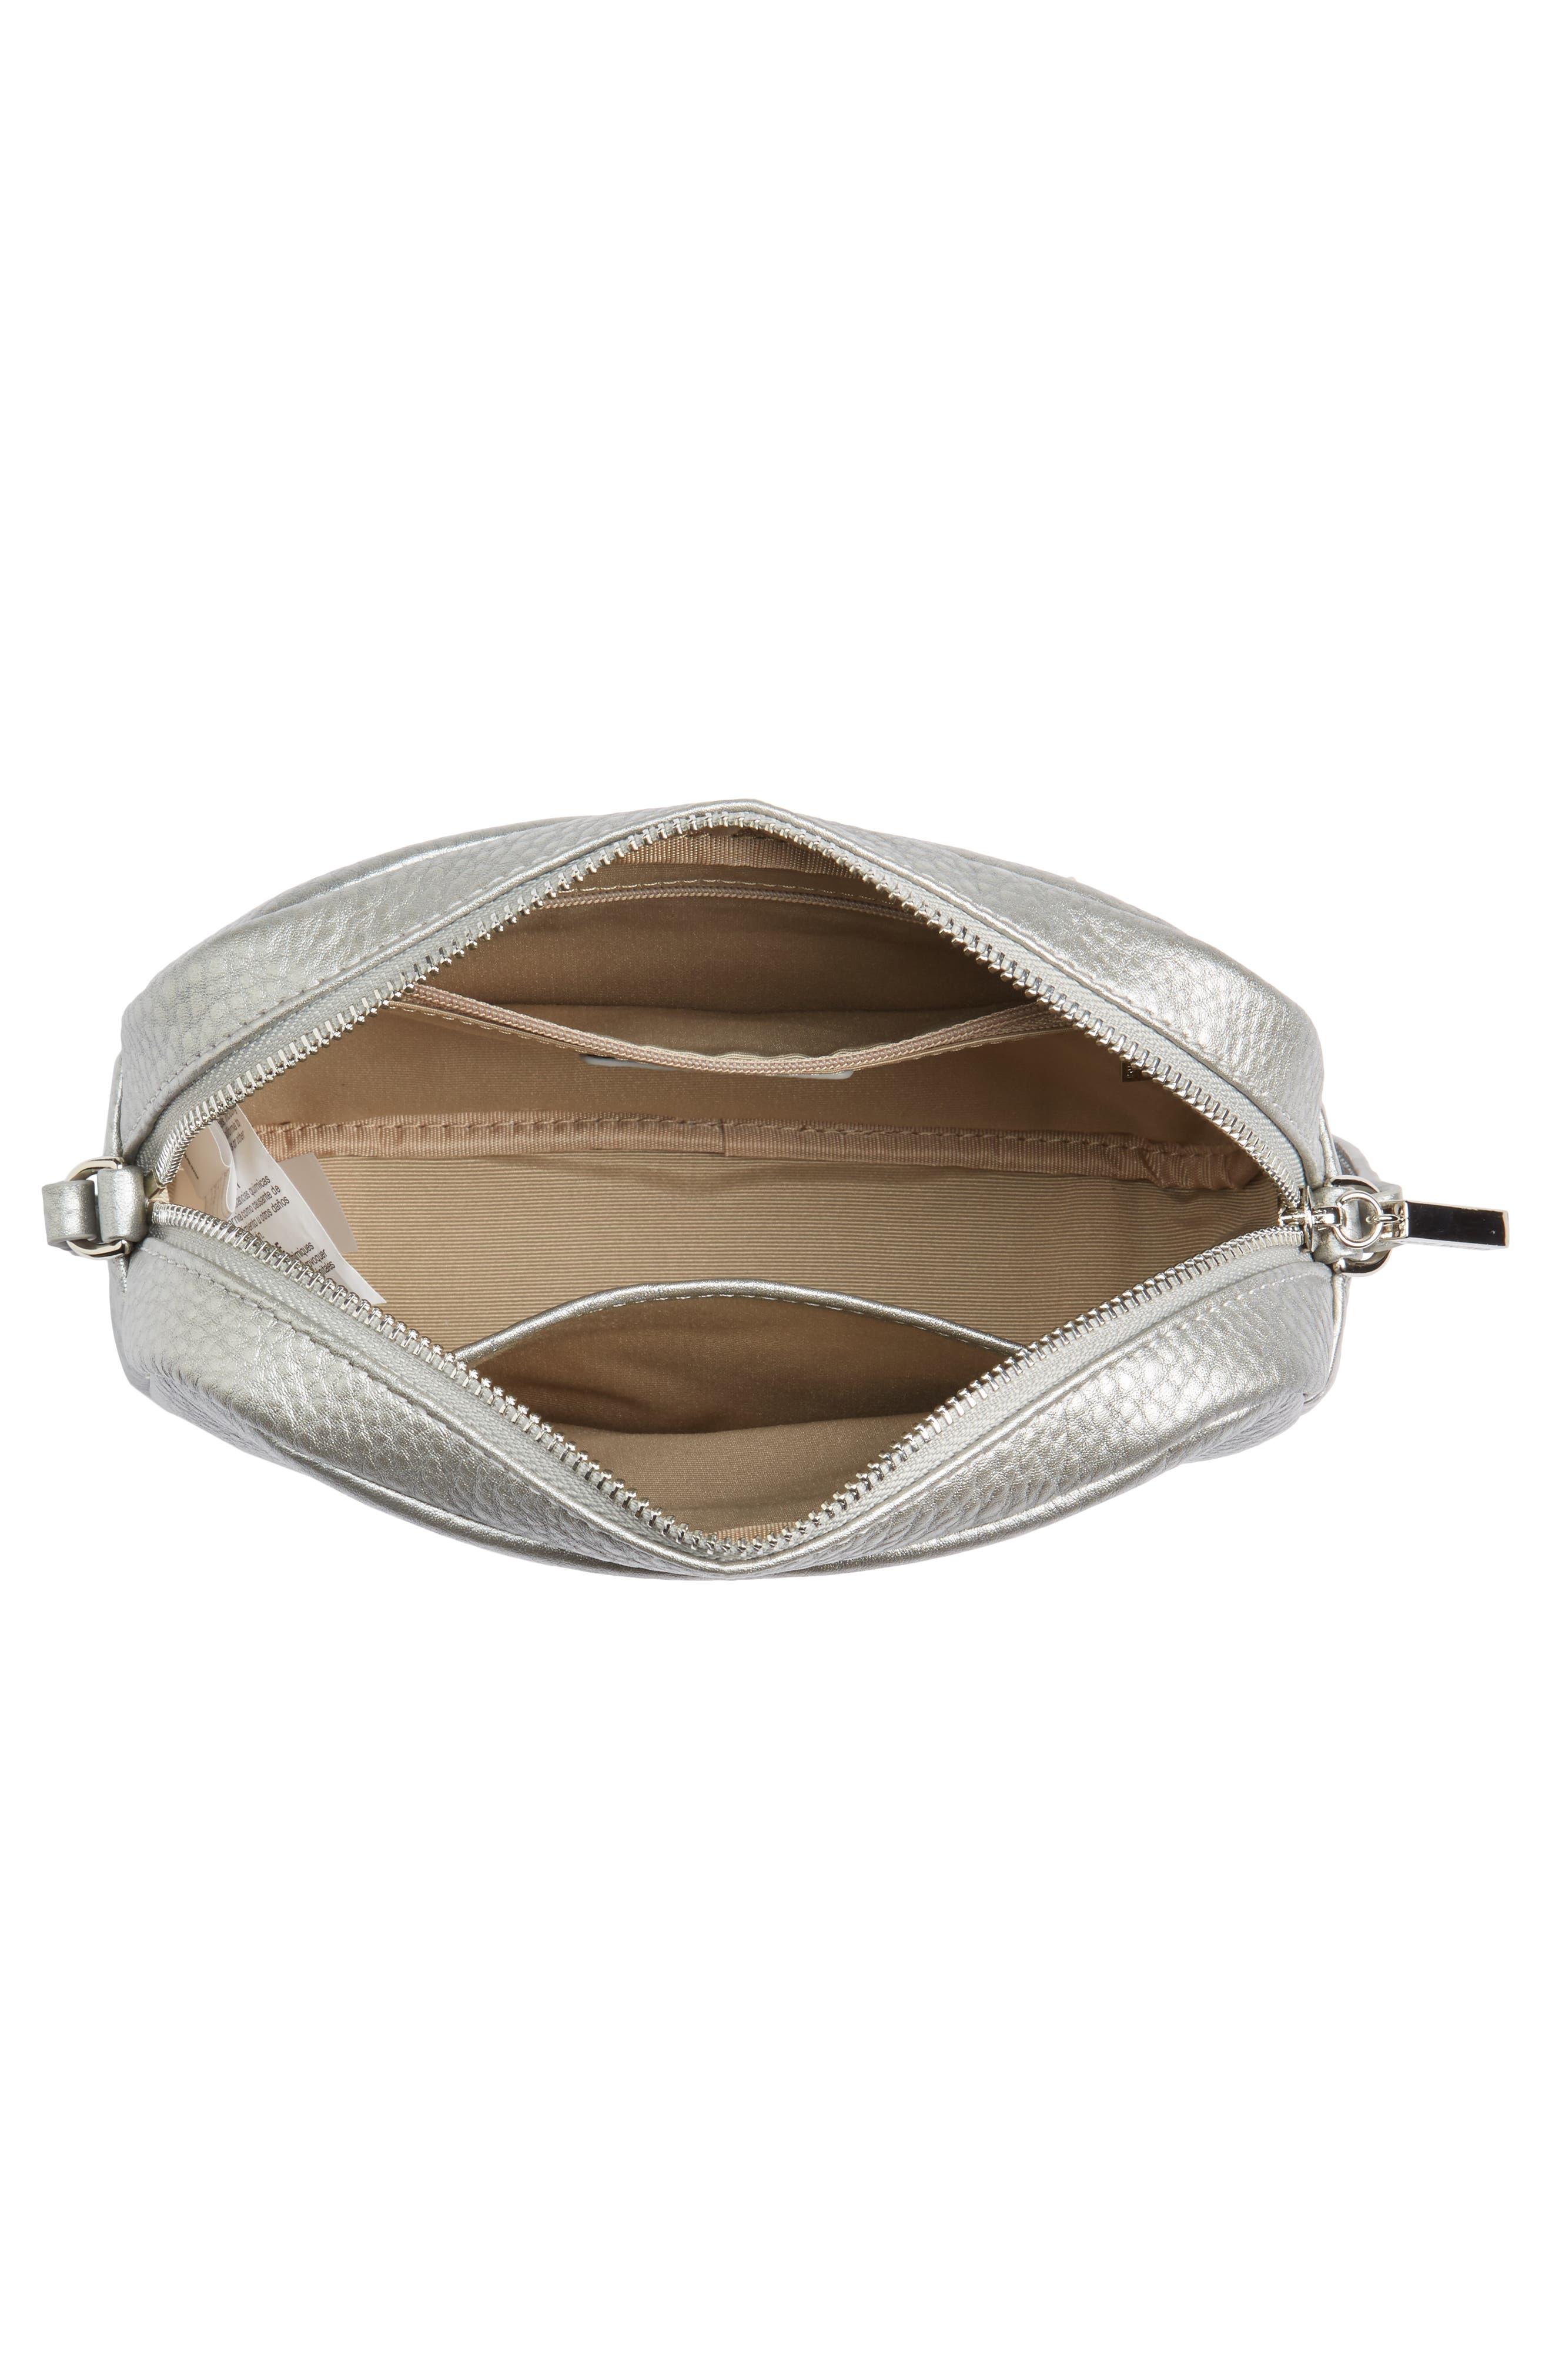 Céline Dion Adagio Leather Camera Crossbody Bag,                             Alternate thumbnail 11, color,